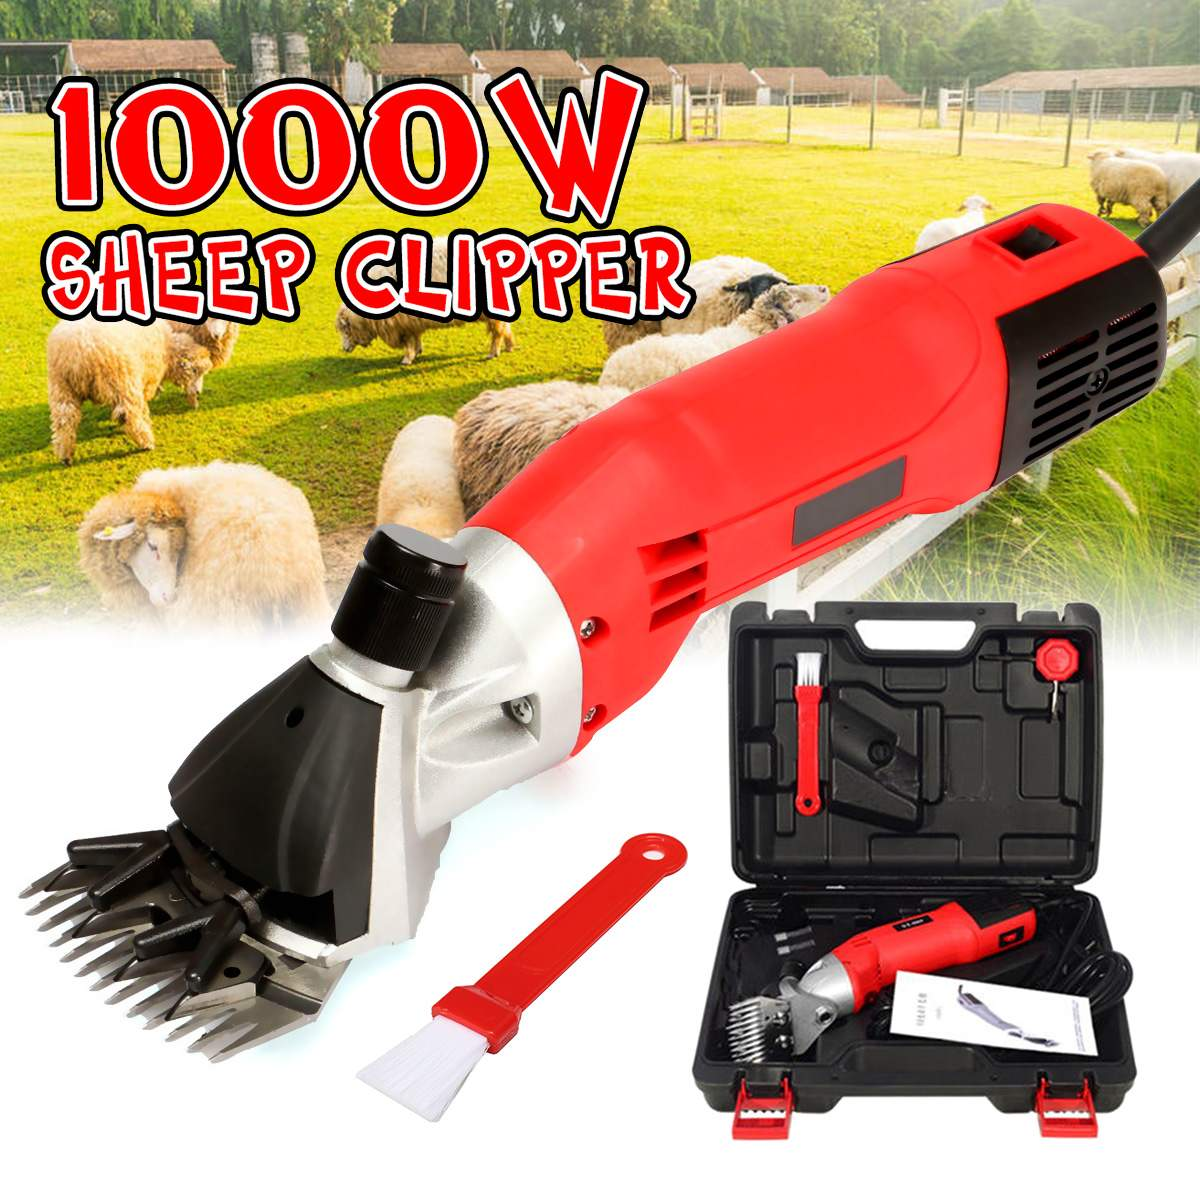 1000W 220V 6 Gears Speed Electric Sheep Goat Shearing Machine Clipper Farm Shears Cutter Wool Scissor Cut Machine With Box